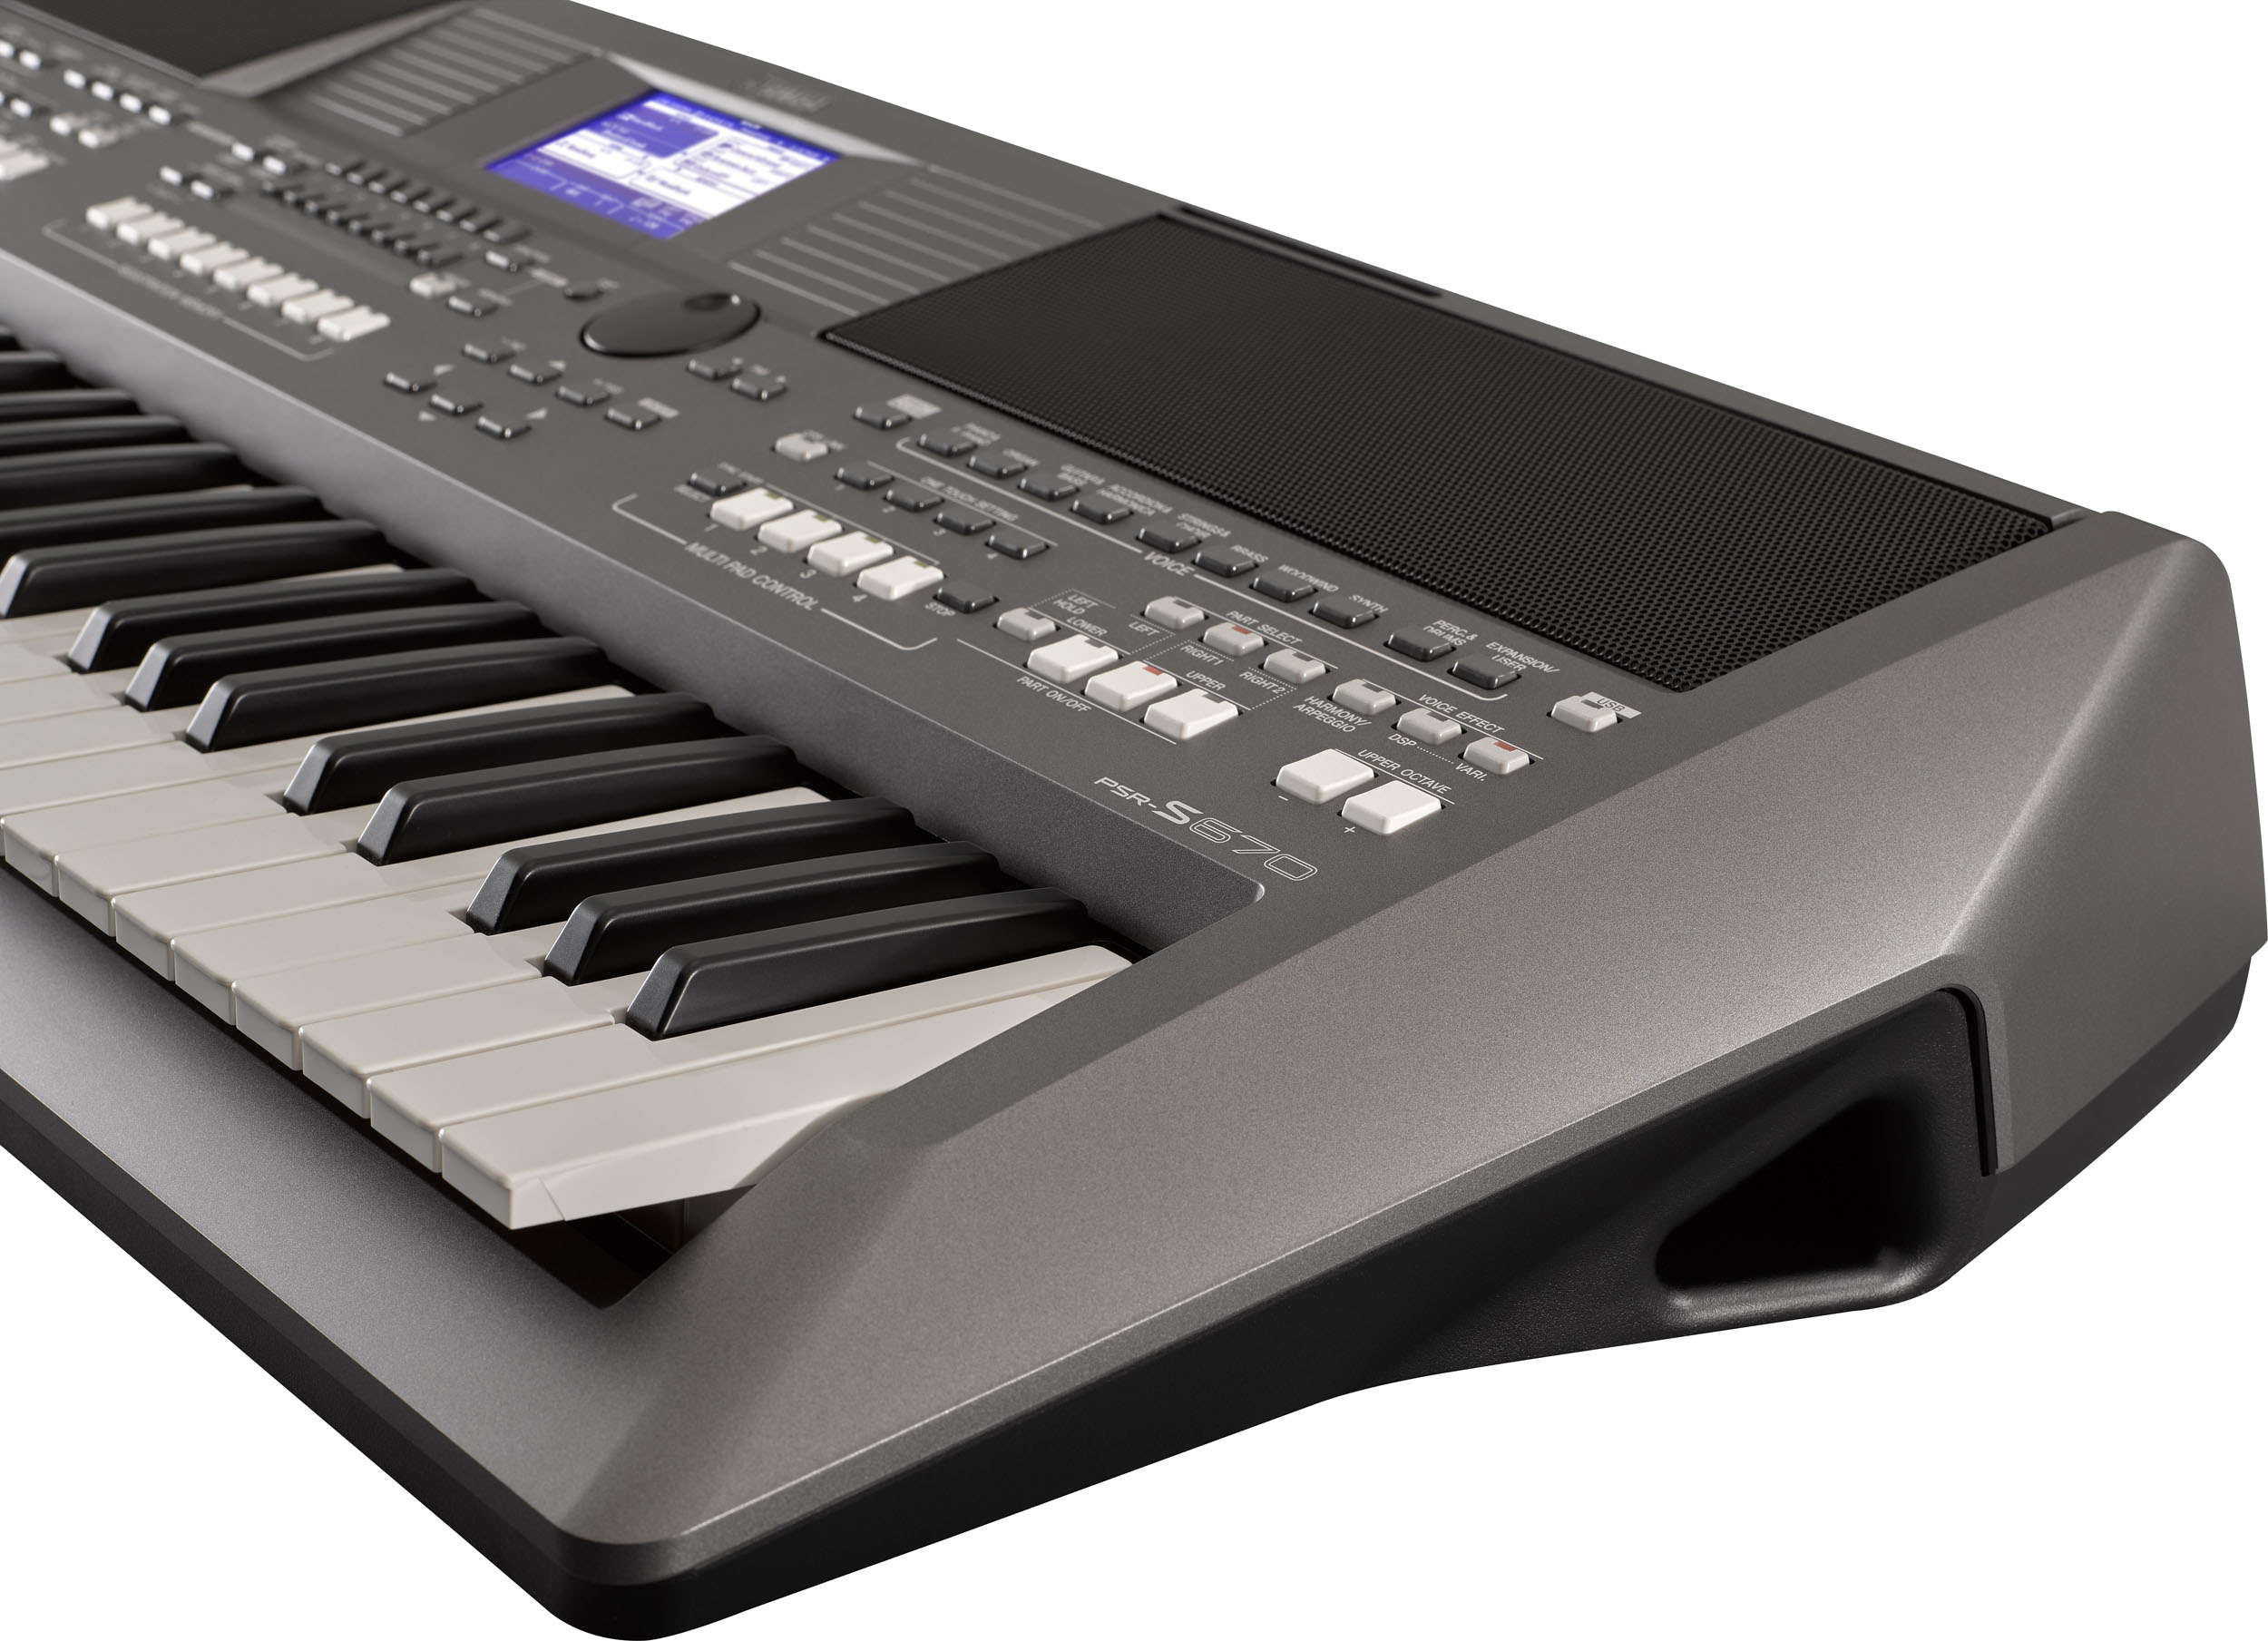 Yamaha Psr S670 Arranger Workstation Keyboard Featuring